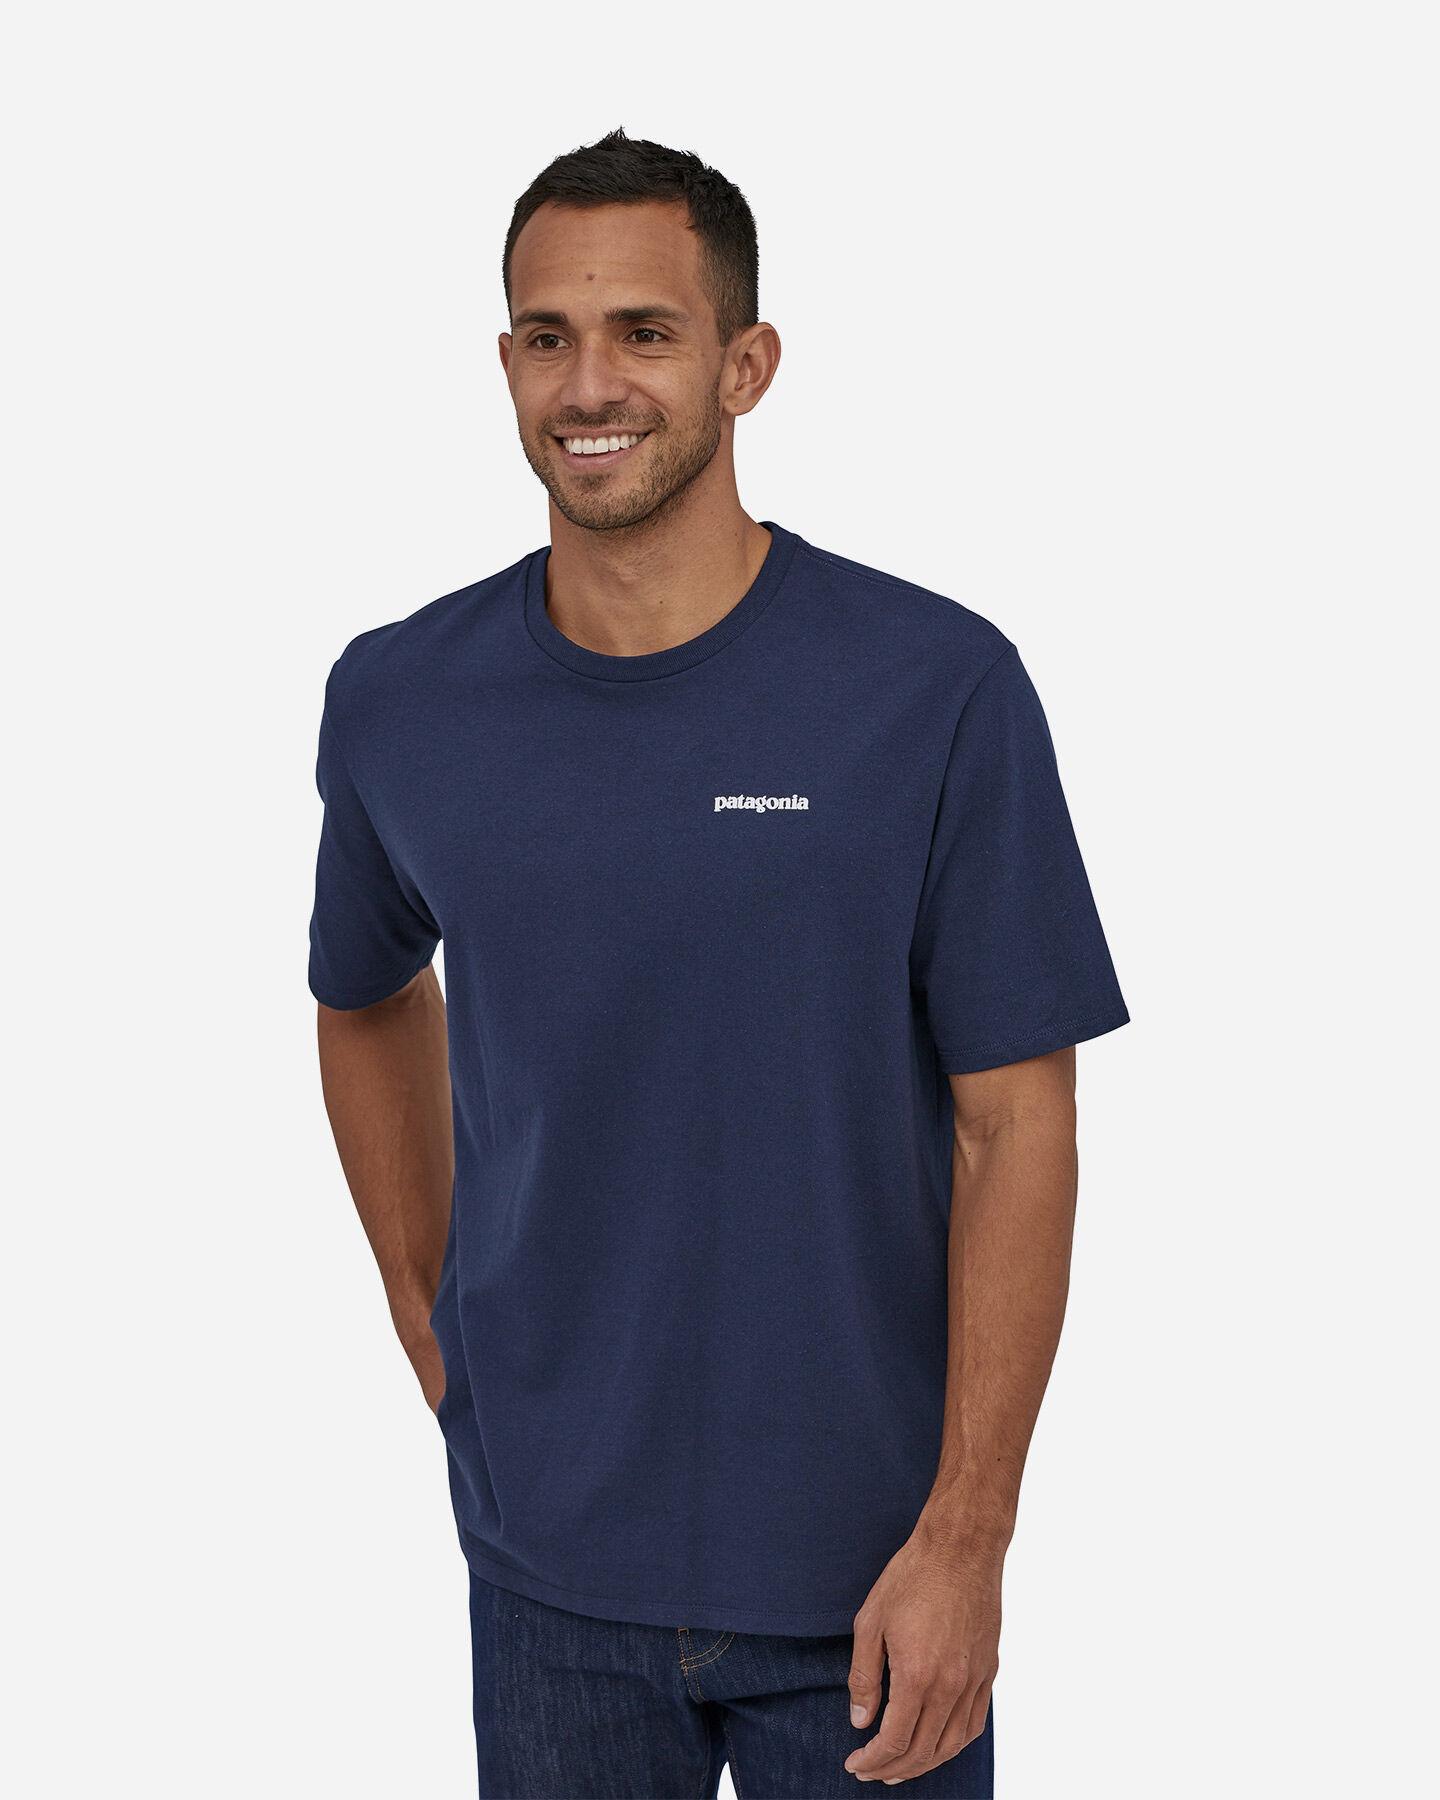 T-Shirt PATAGONIA P-6 LOGO M S4089221 scatto 0